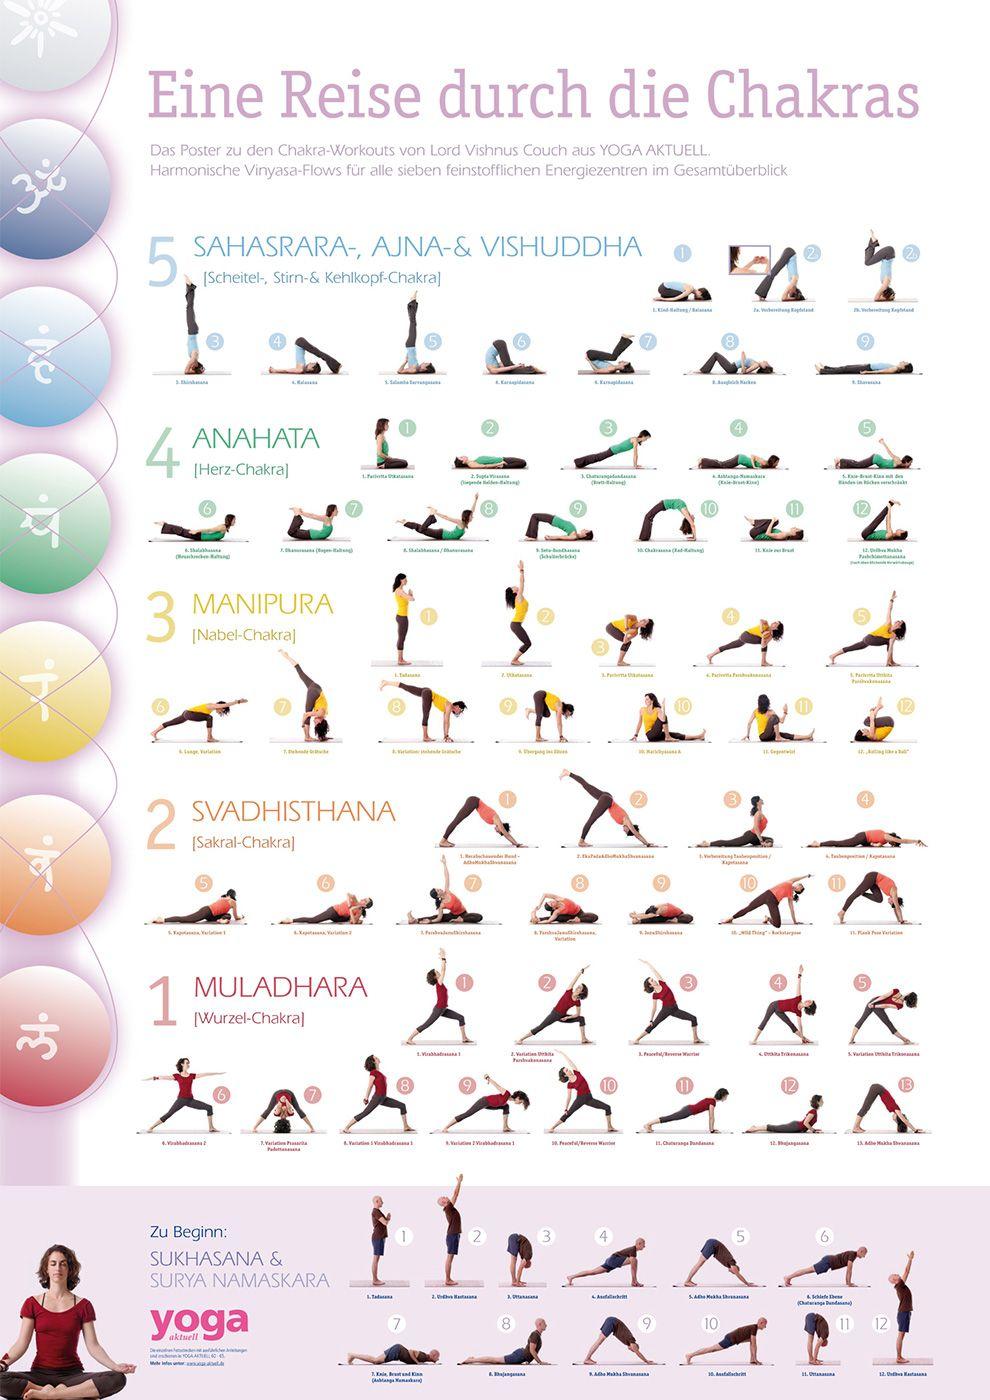 Chakra-Workout-Poster im YogaAktuell kaufen | Yoga Magazin | Yoga ...